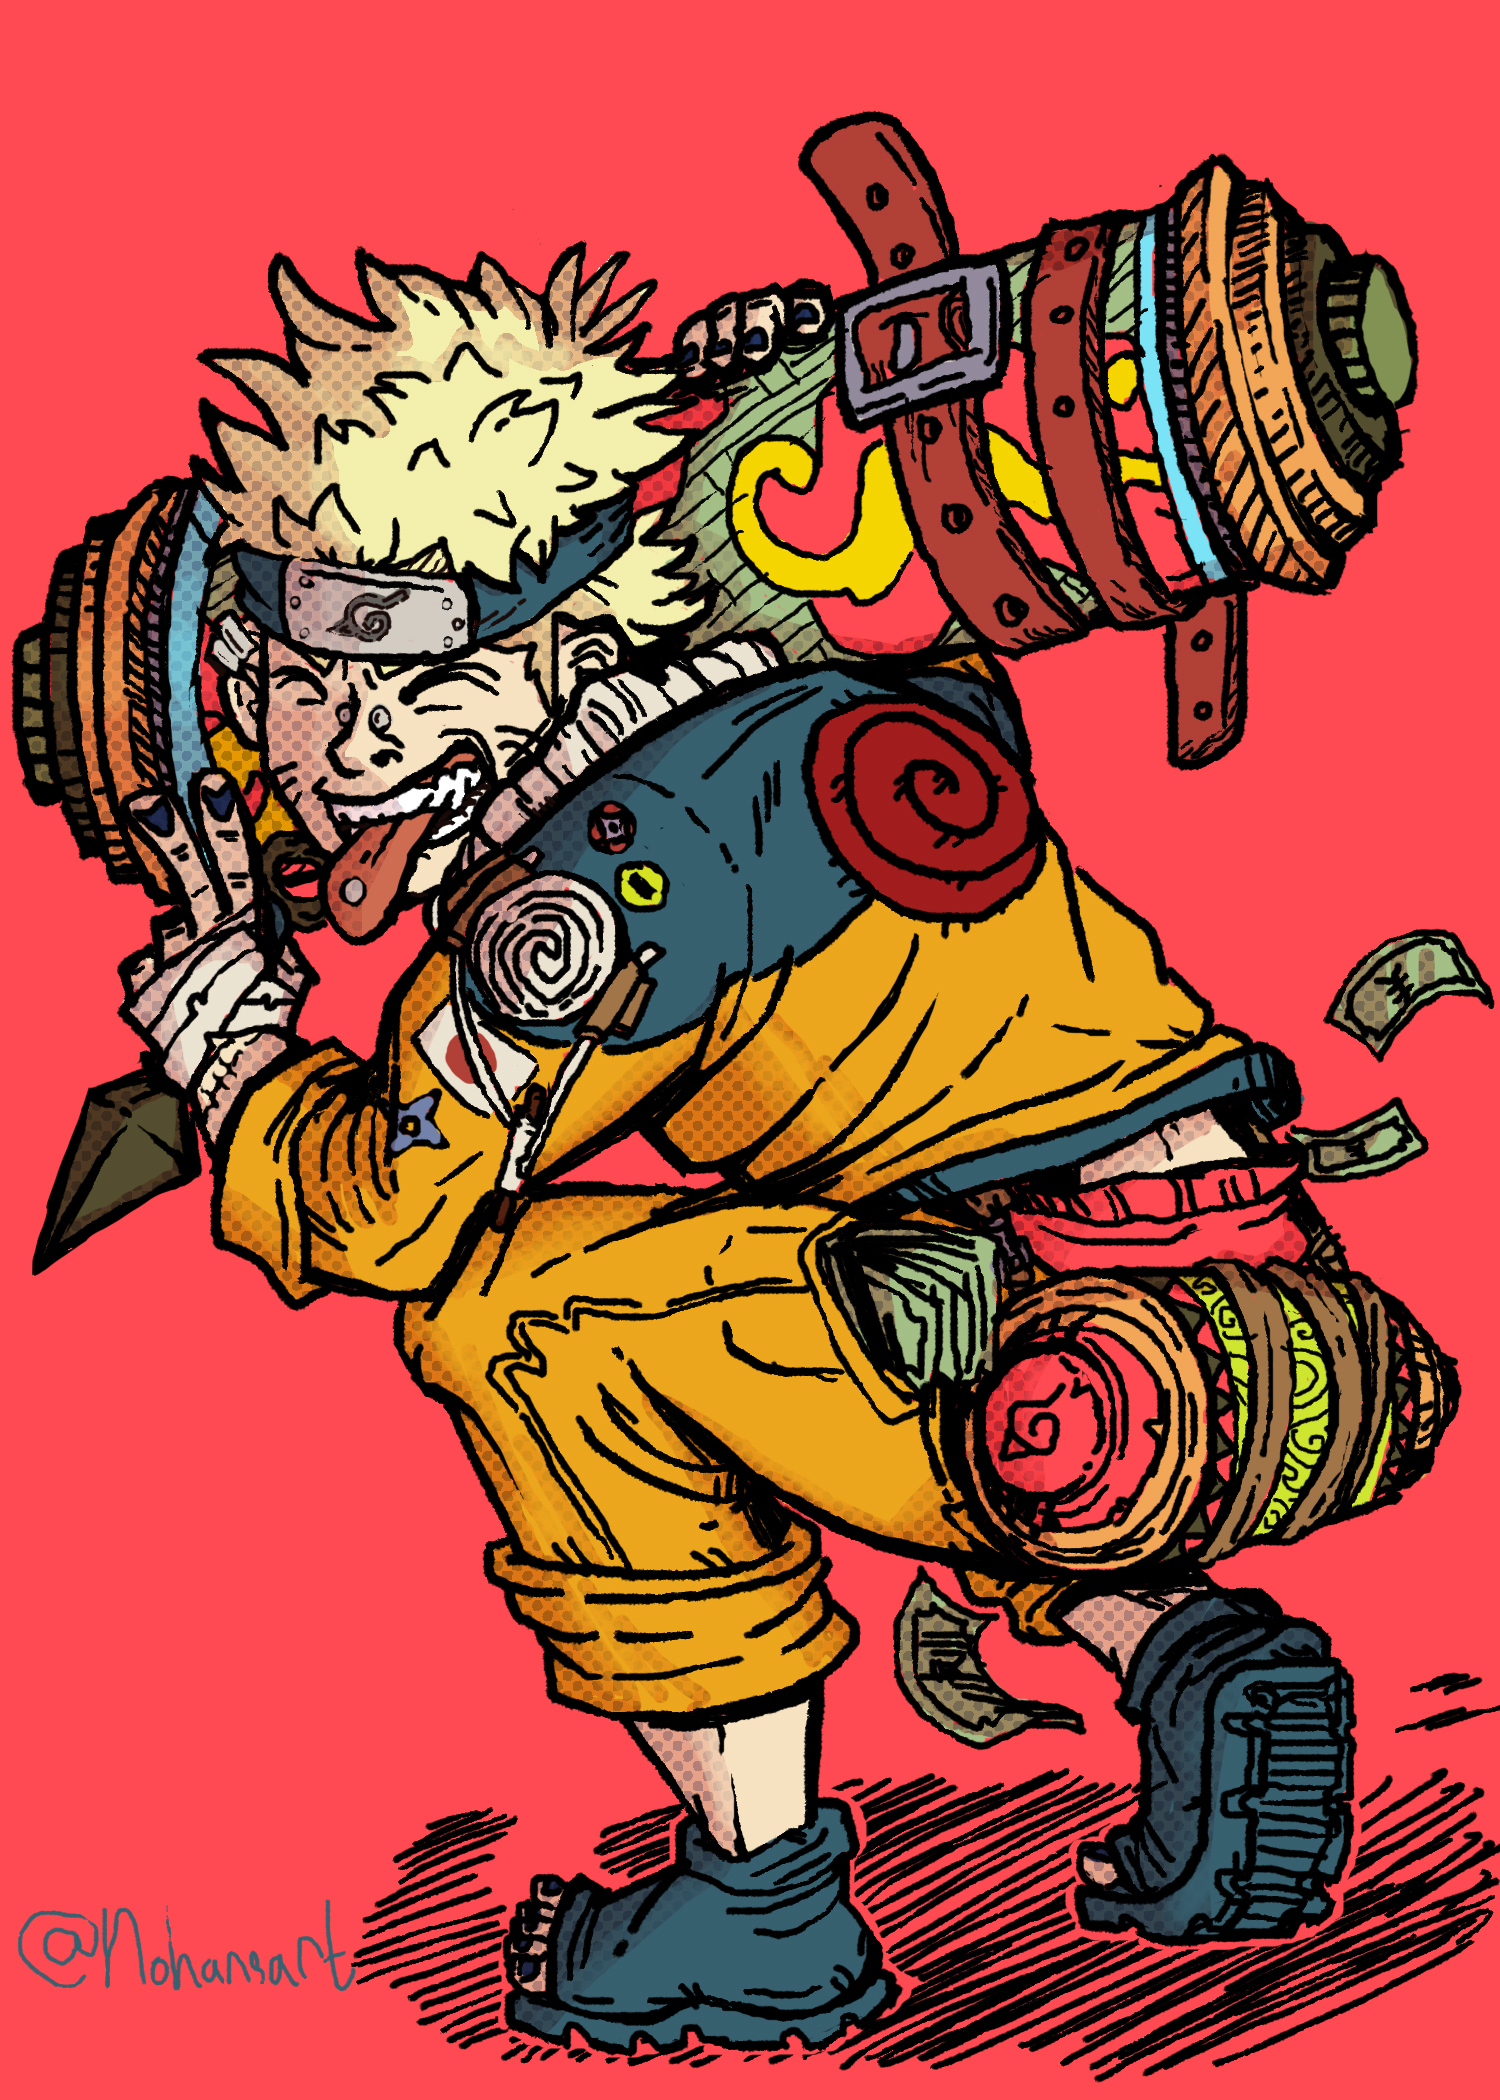 Naruto from Naruto